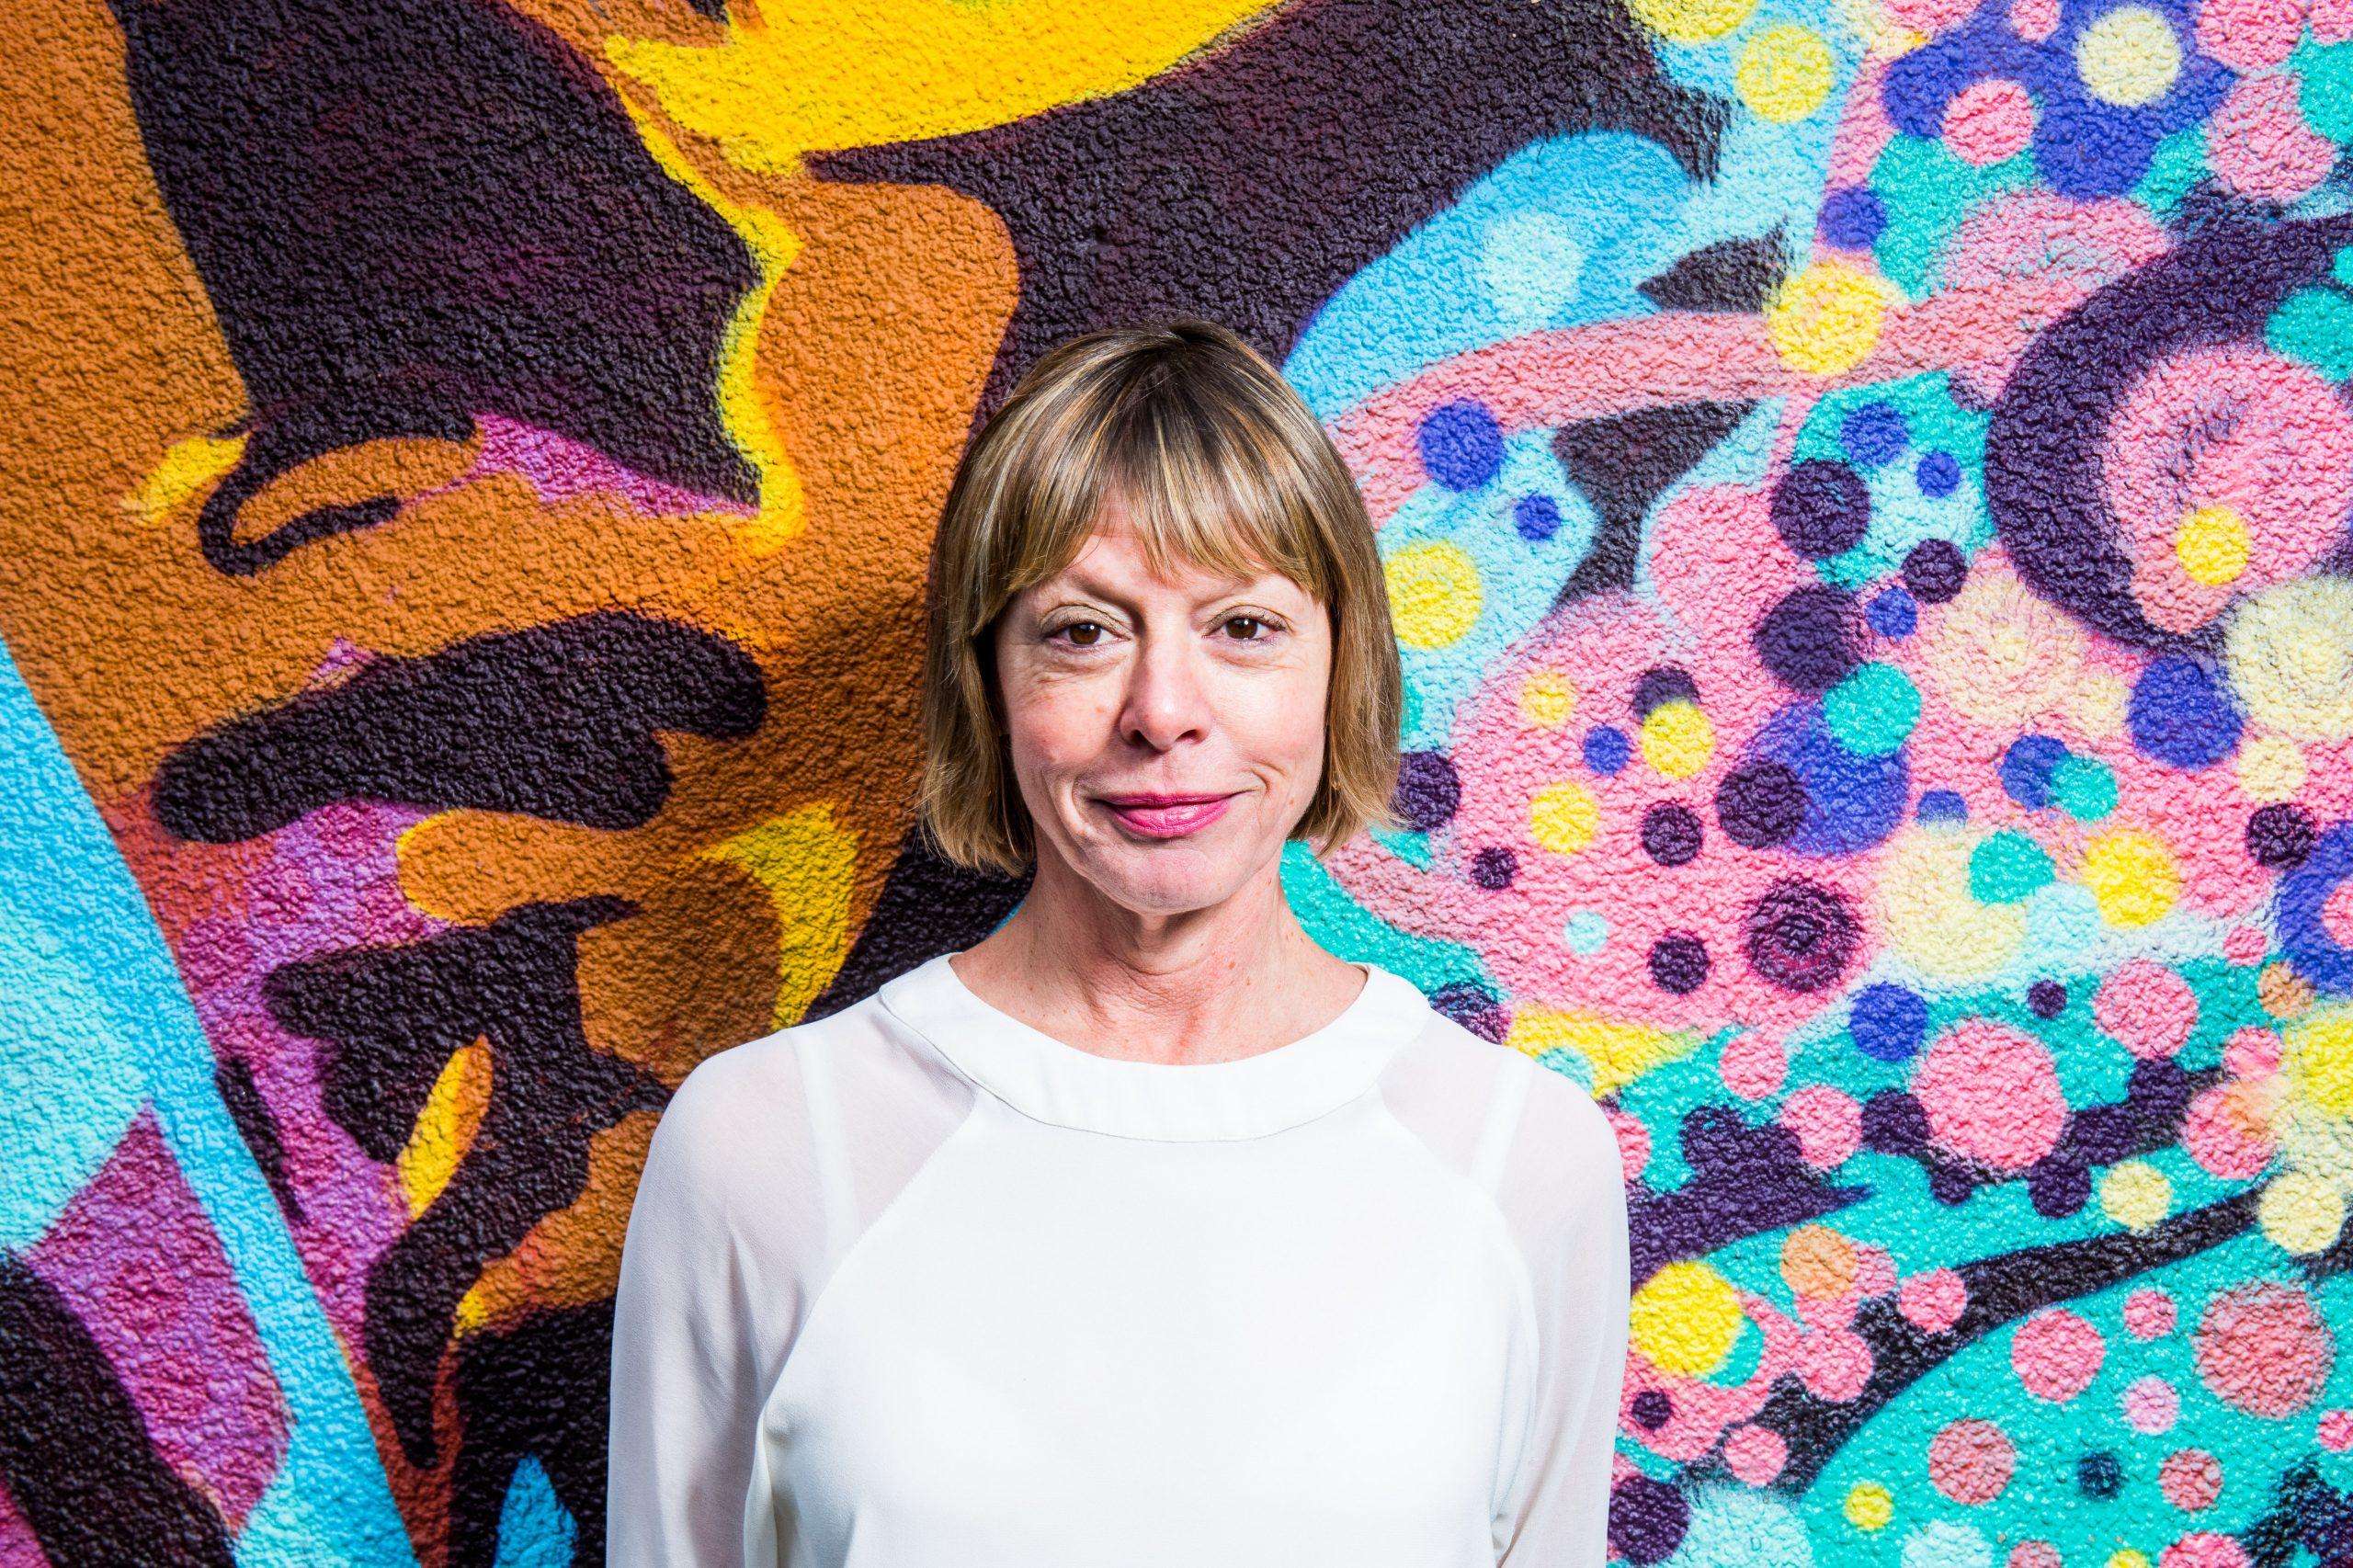 Sue Radford